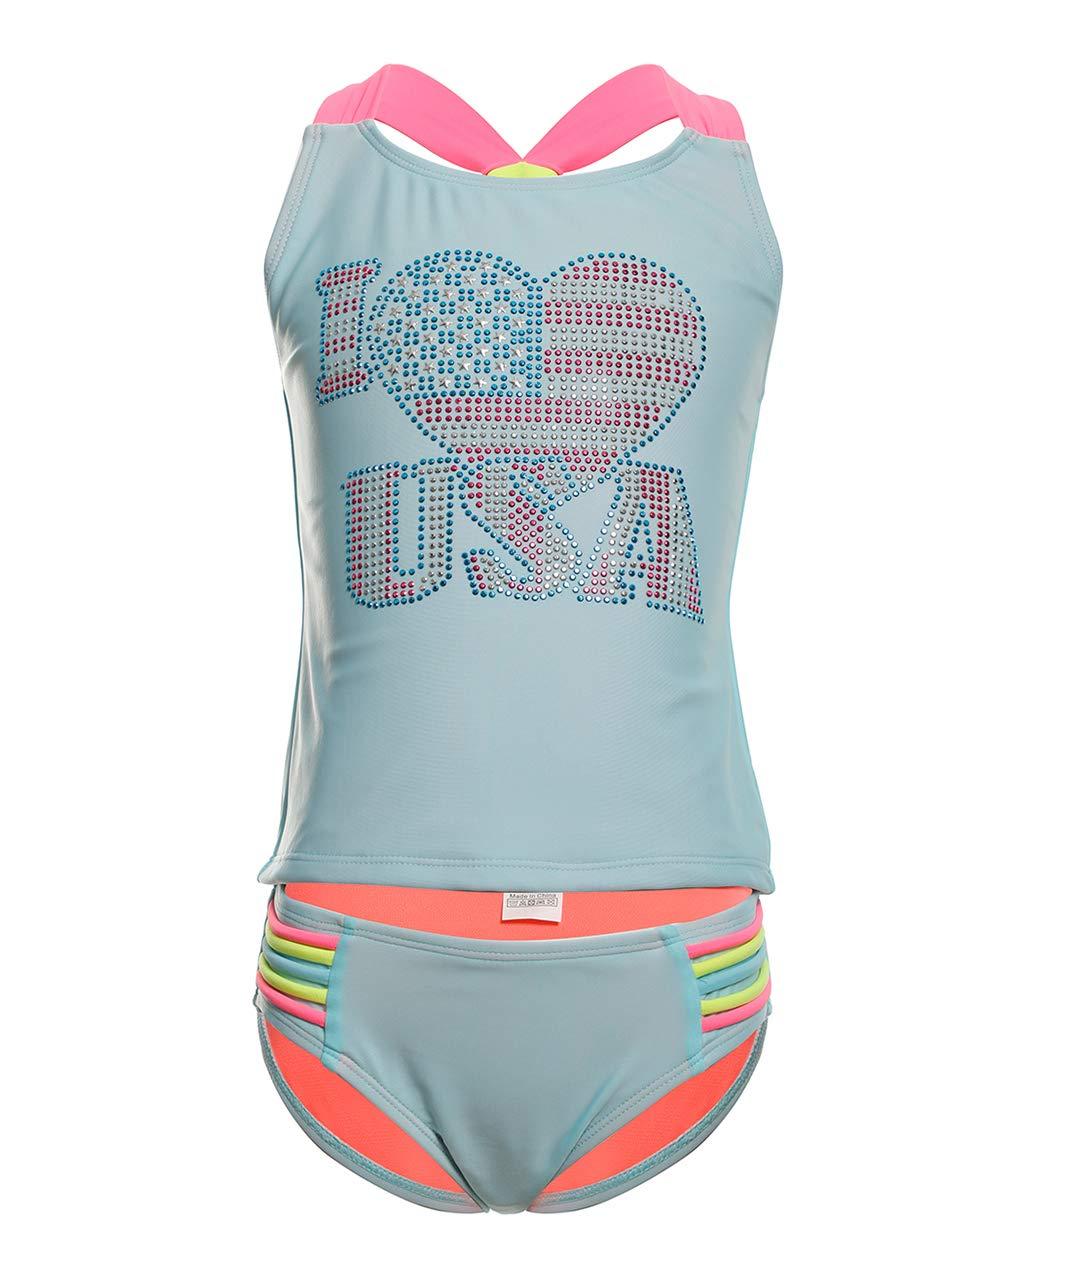 BELLOO Kids Girls Two Pieces Swimsuits, Tankini Set Swimwear Lightblue, Size 4-5